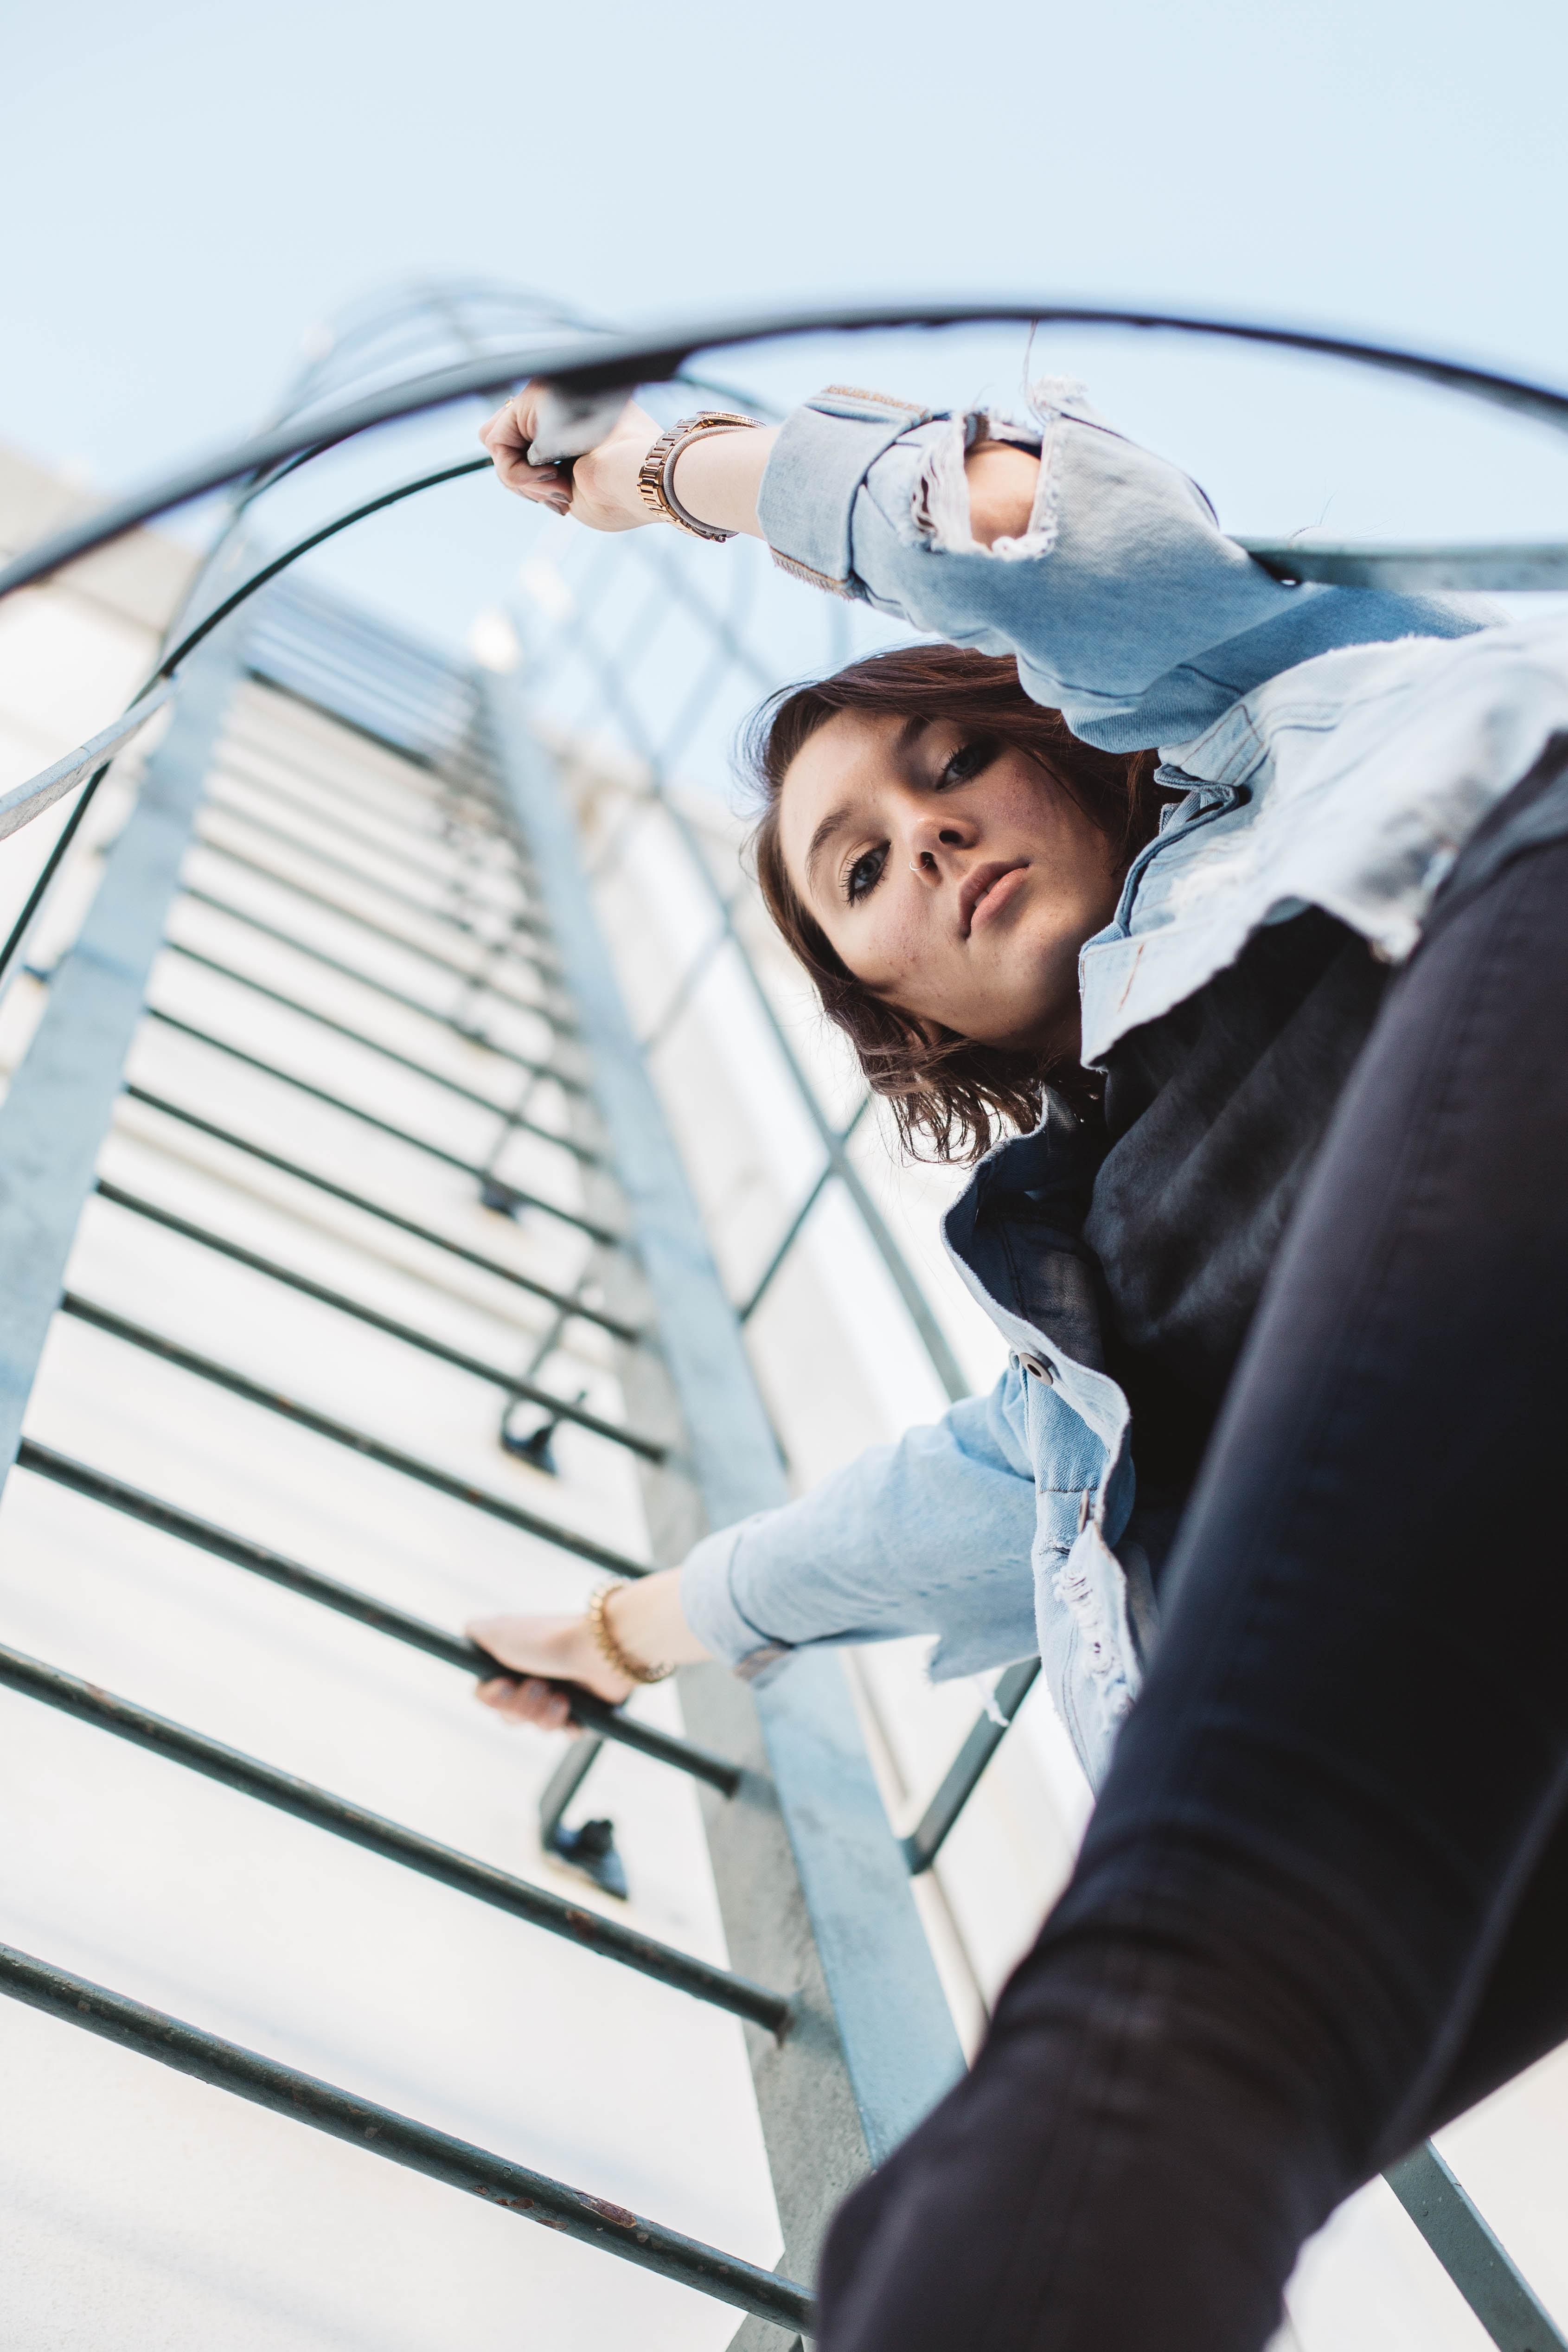 woman climbing on ladder